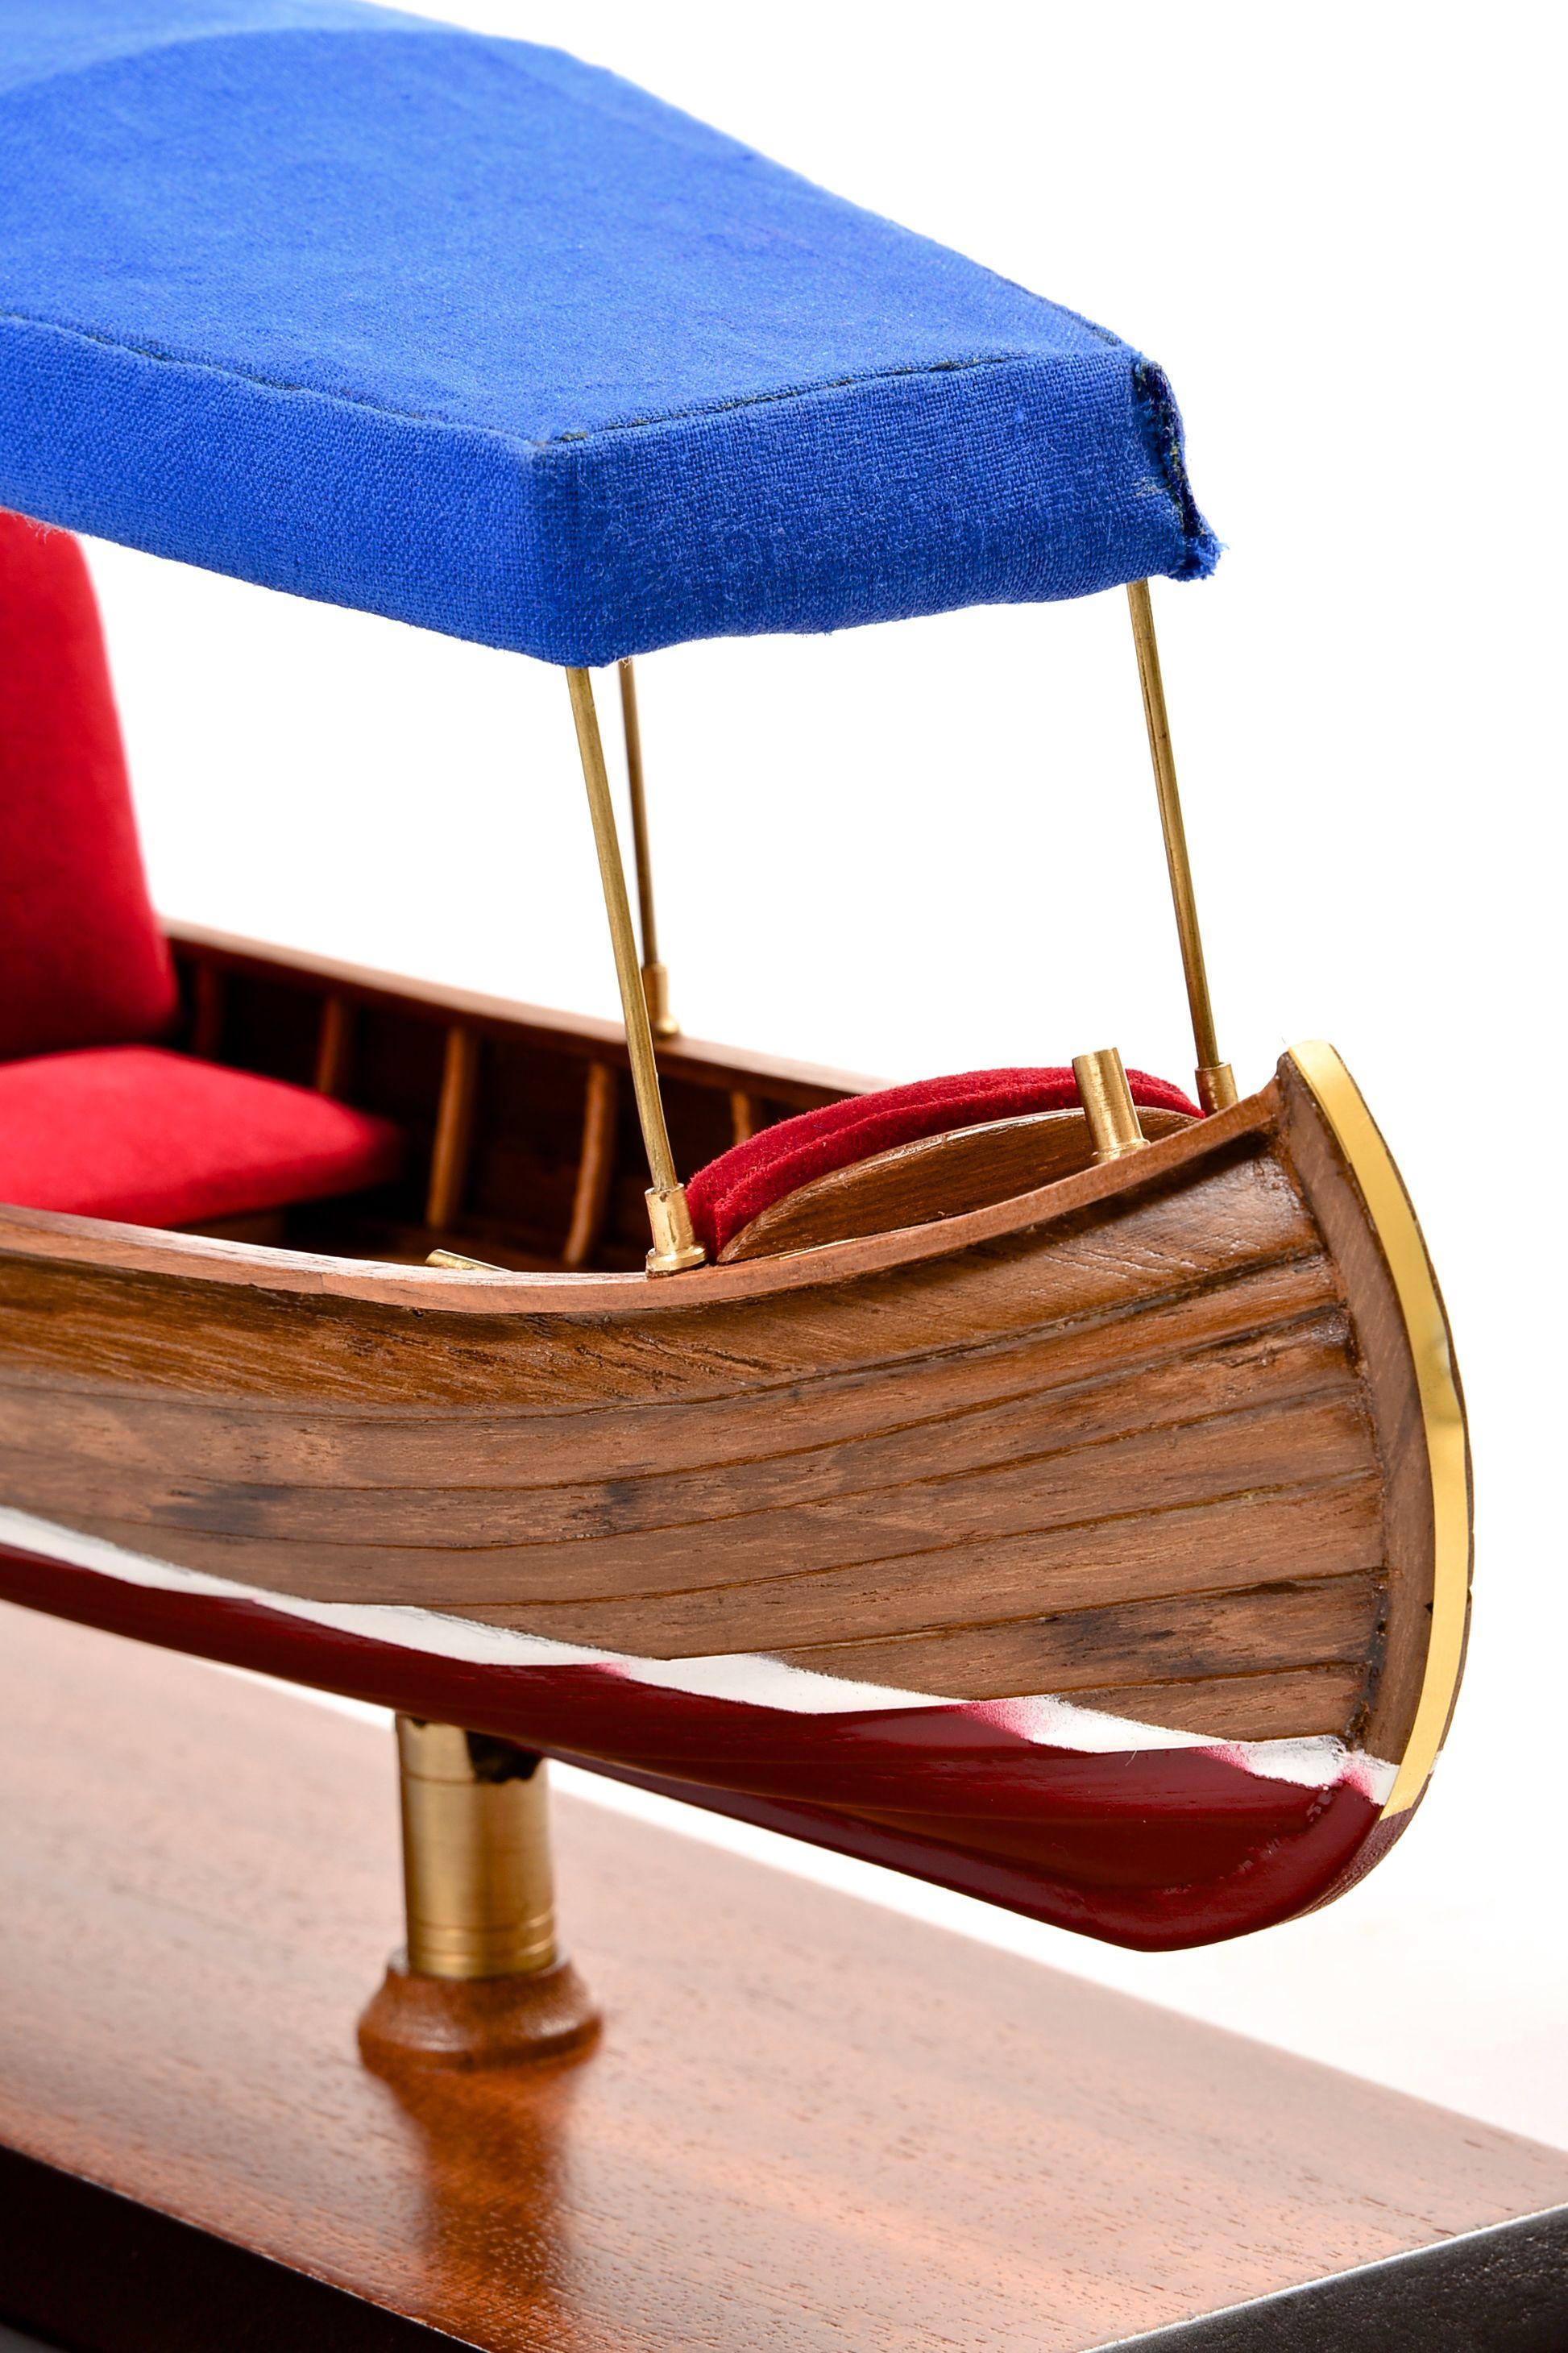 1865-11224-Liddesdale-Electric-Canoe-1920